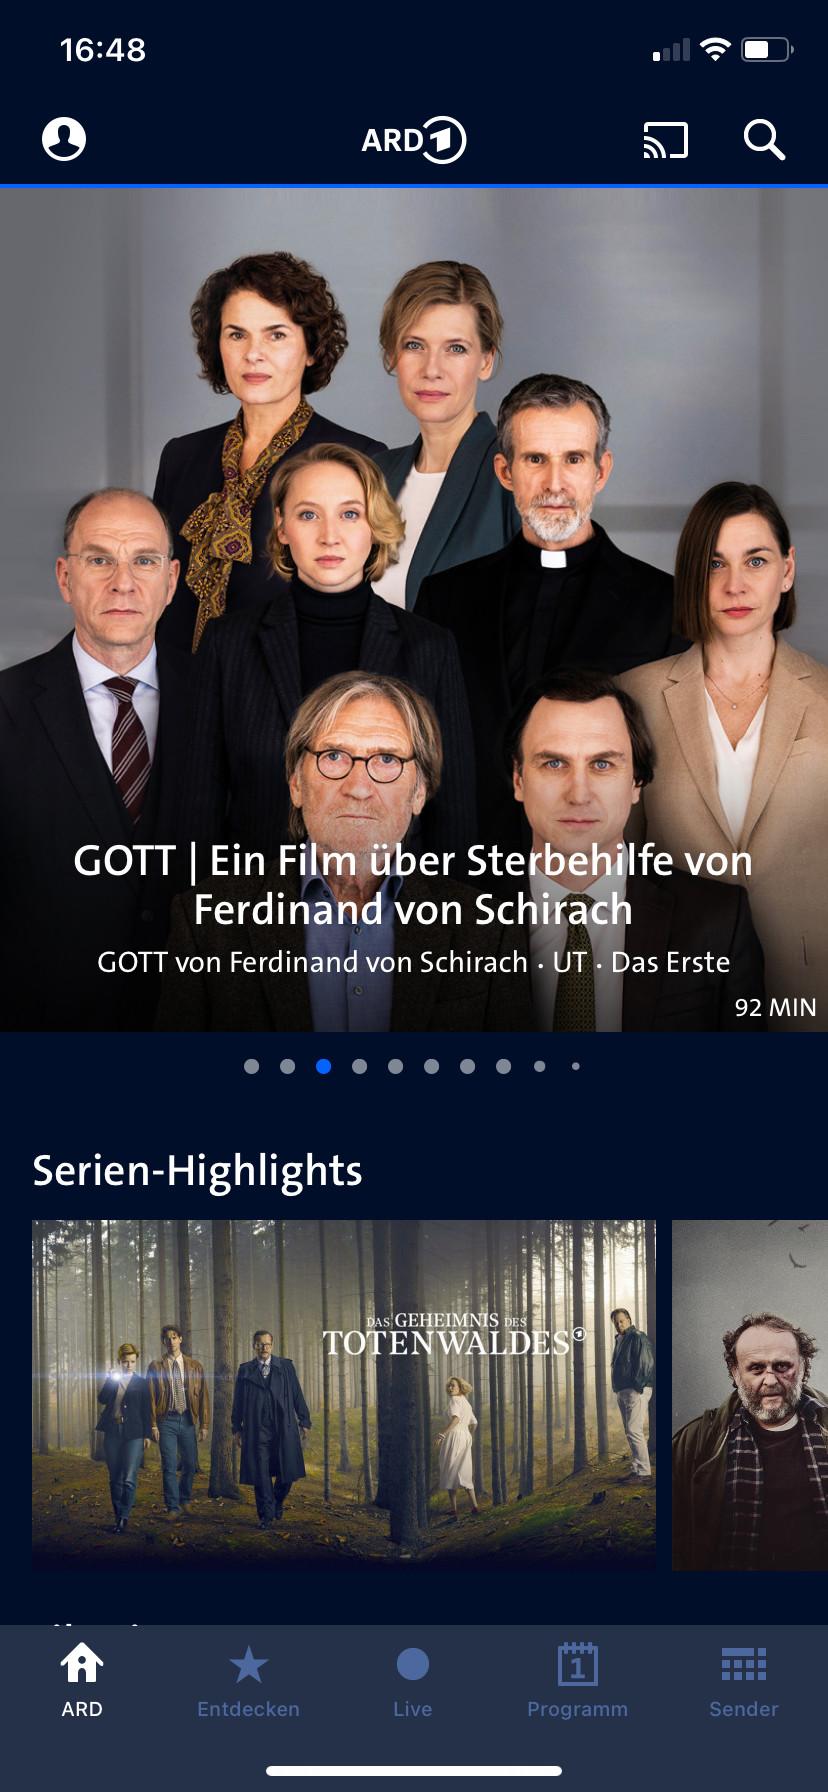 Screenshot 1 - ARD Mediathek (App für iPhone & iPad)